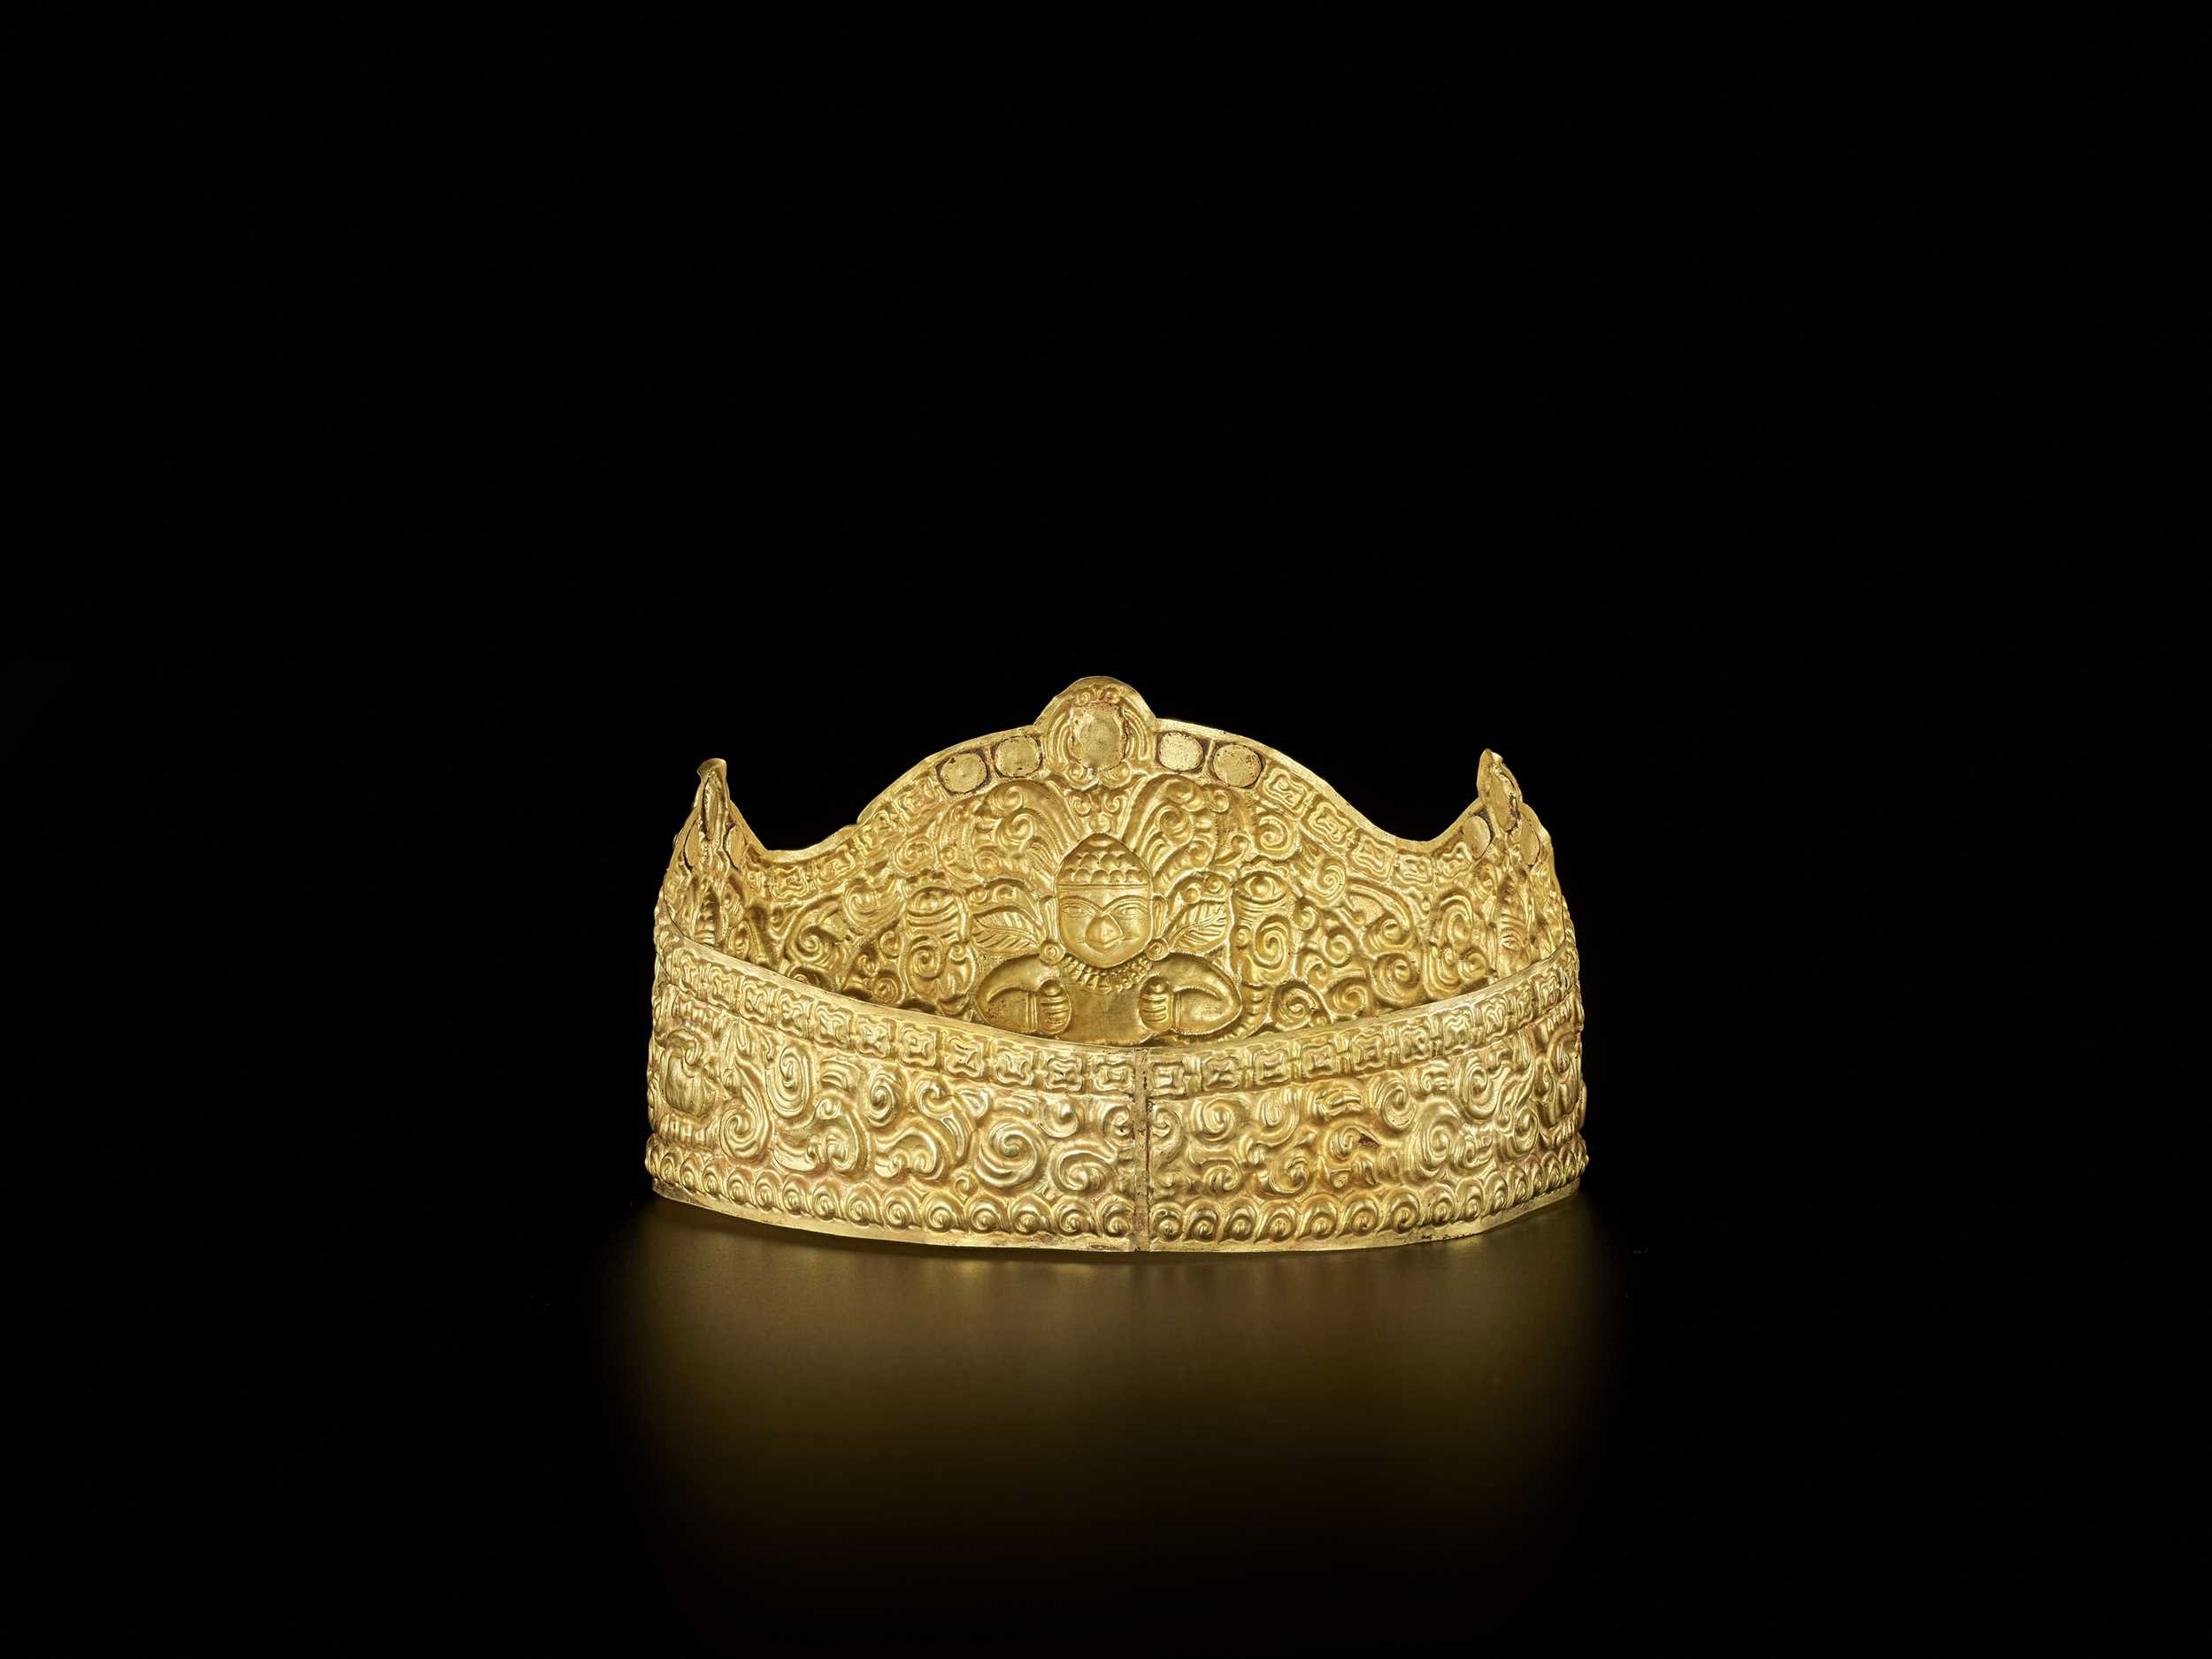 AN EXTRE MELY RARE AND FINE CHAM GEMSTONE-SET GOLD REPOUSSÉ CROWN WITH GARUDAS - Bild 7 aus 9